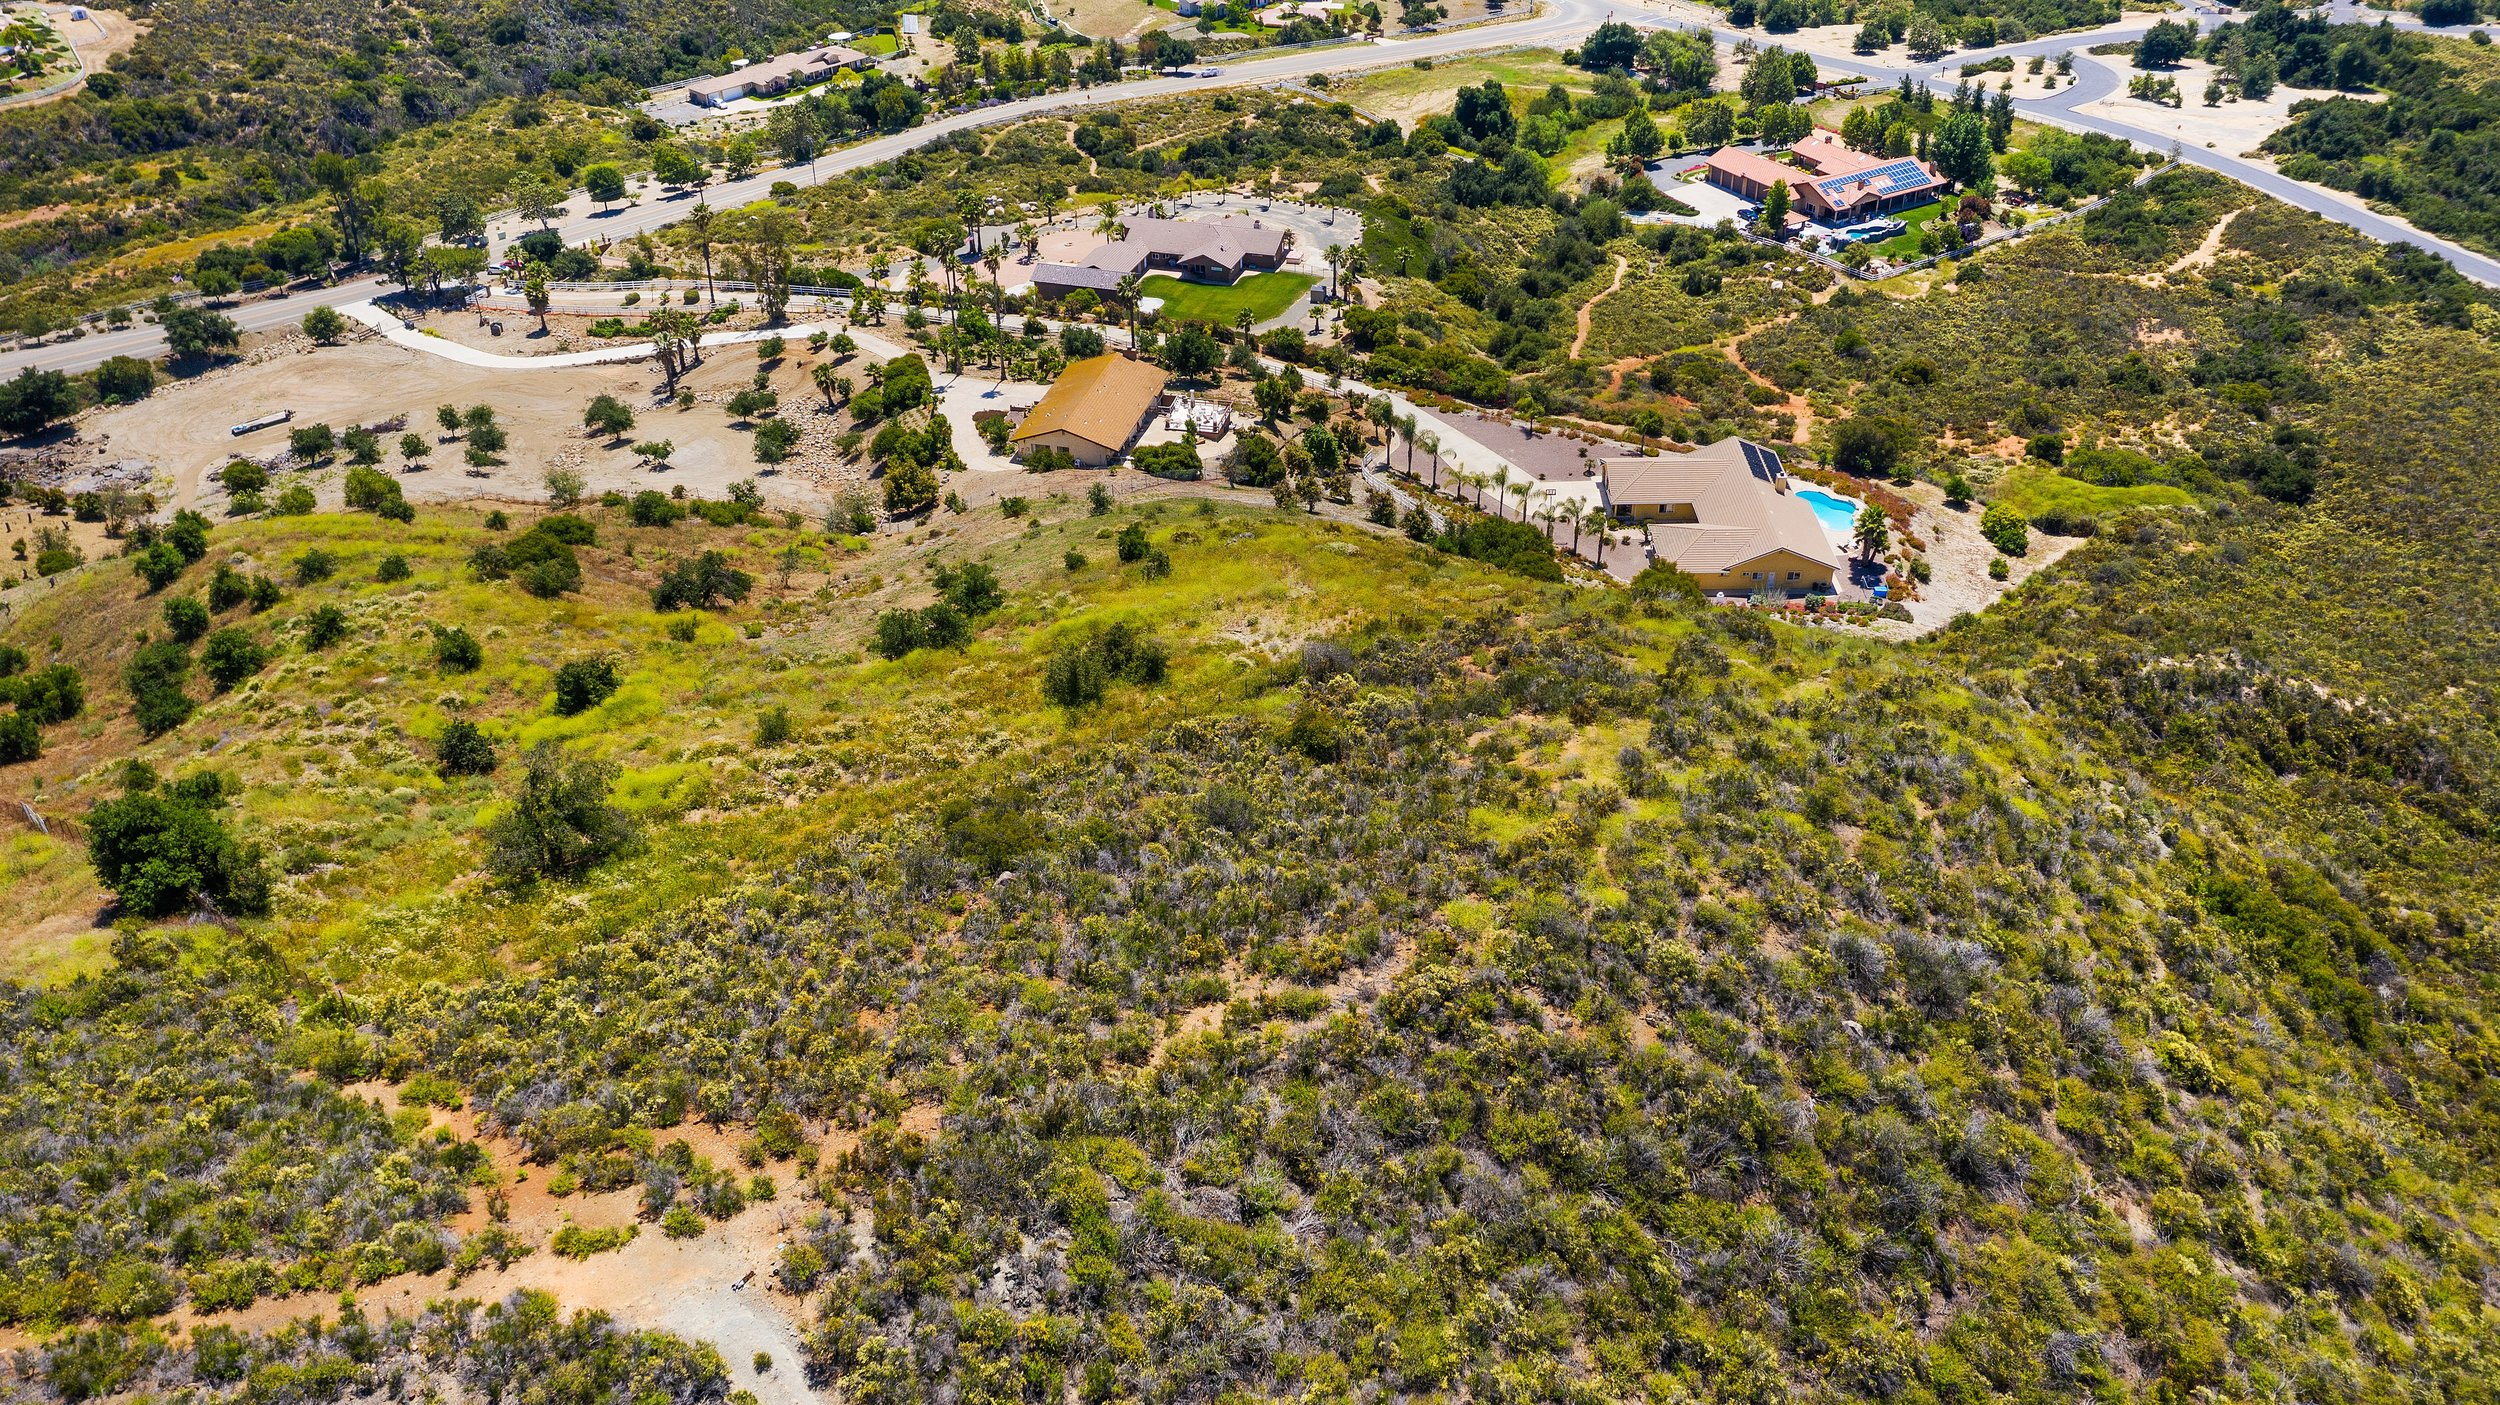 045_Aerial Property View.jpg